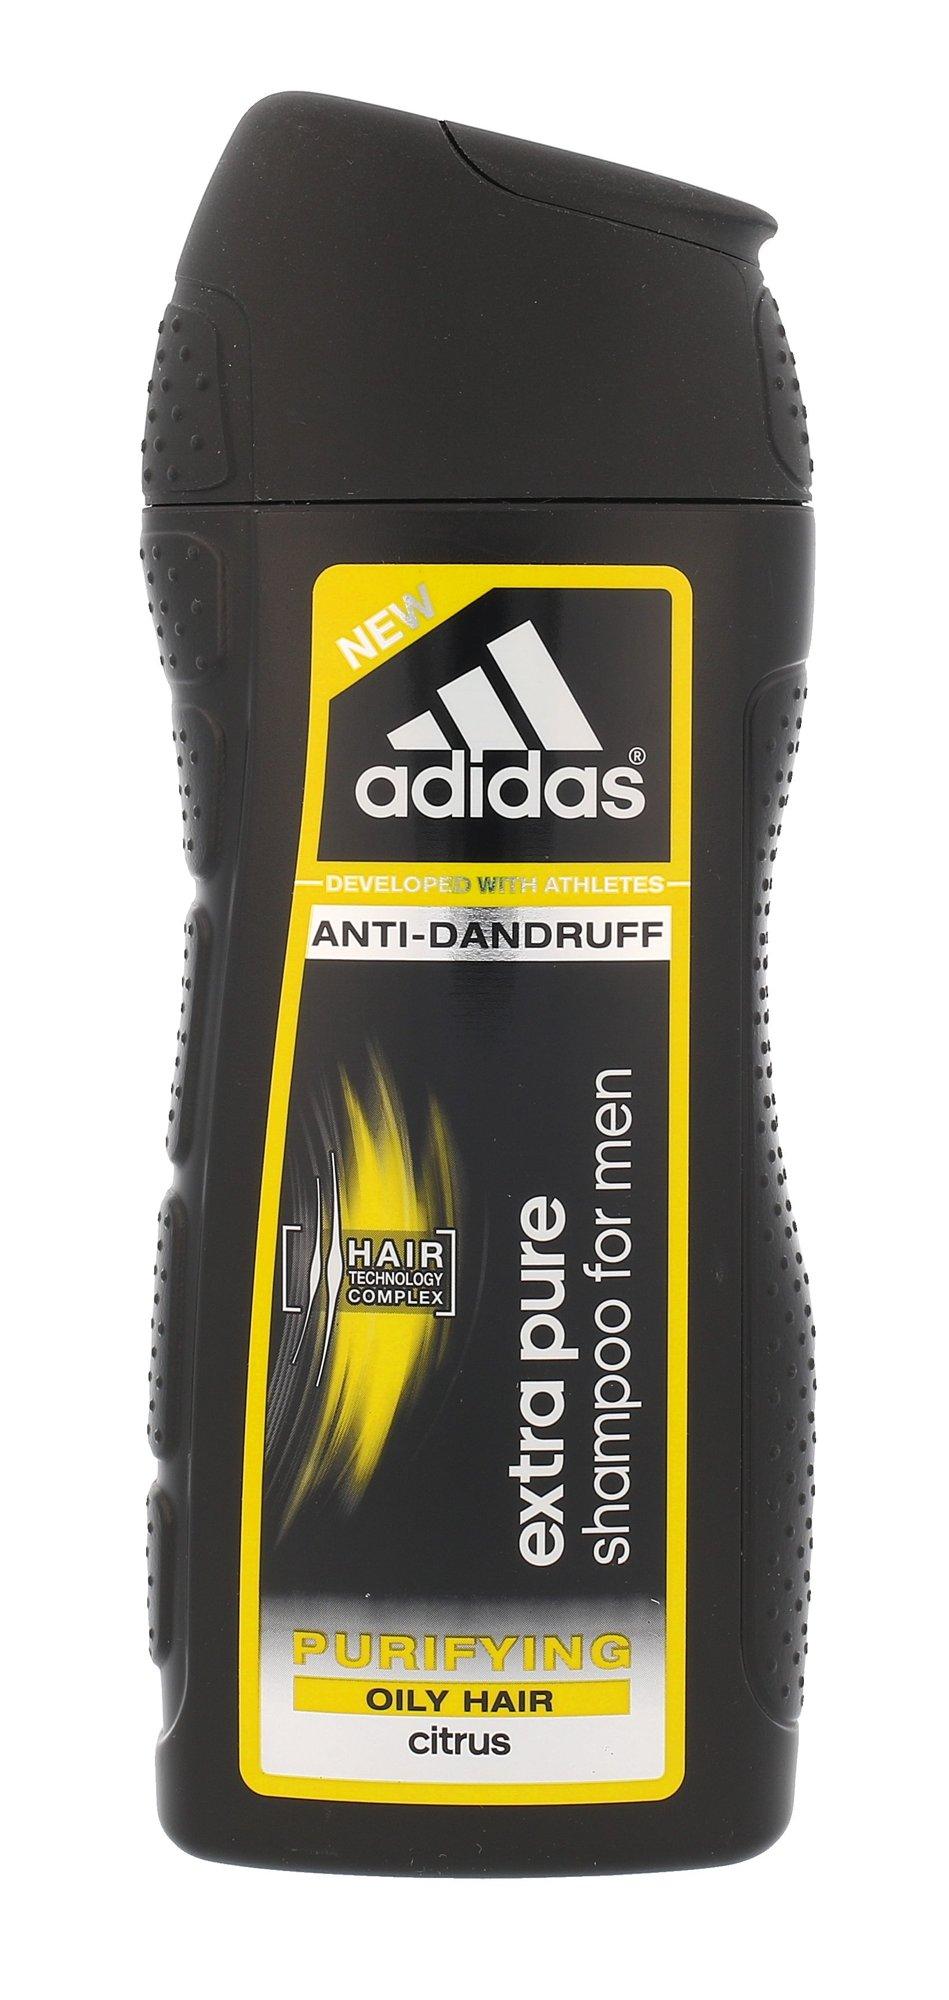 Adidas Extra Pure Shampoo 200ml